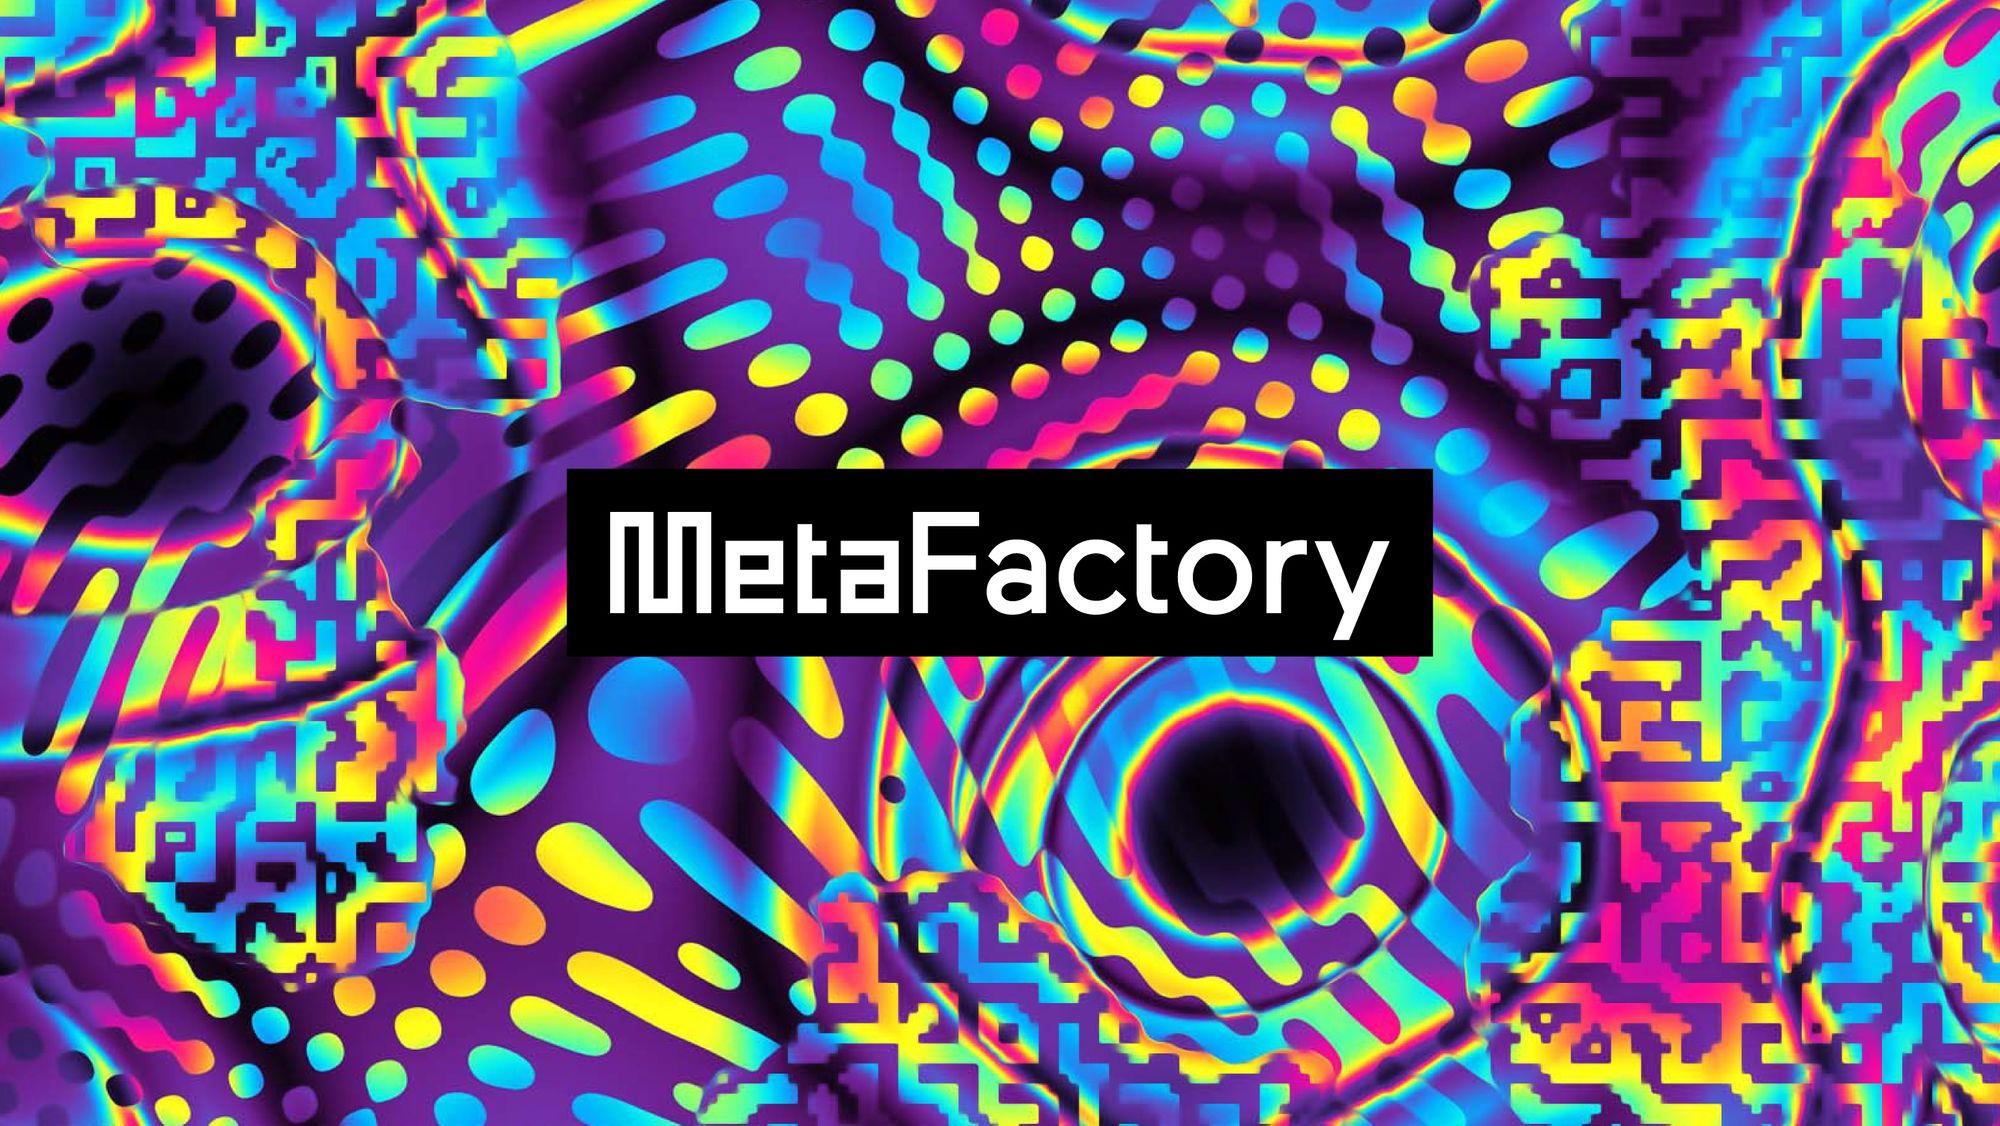 MetaFactory 发布治理代币 $ROBOT